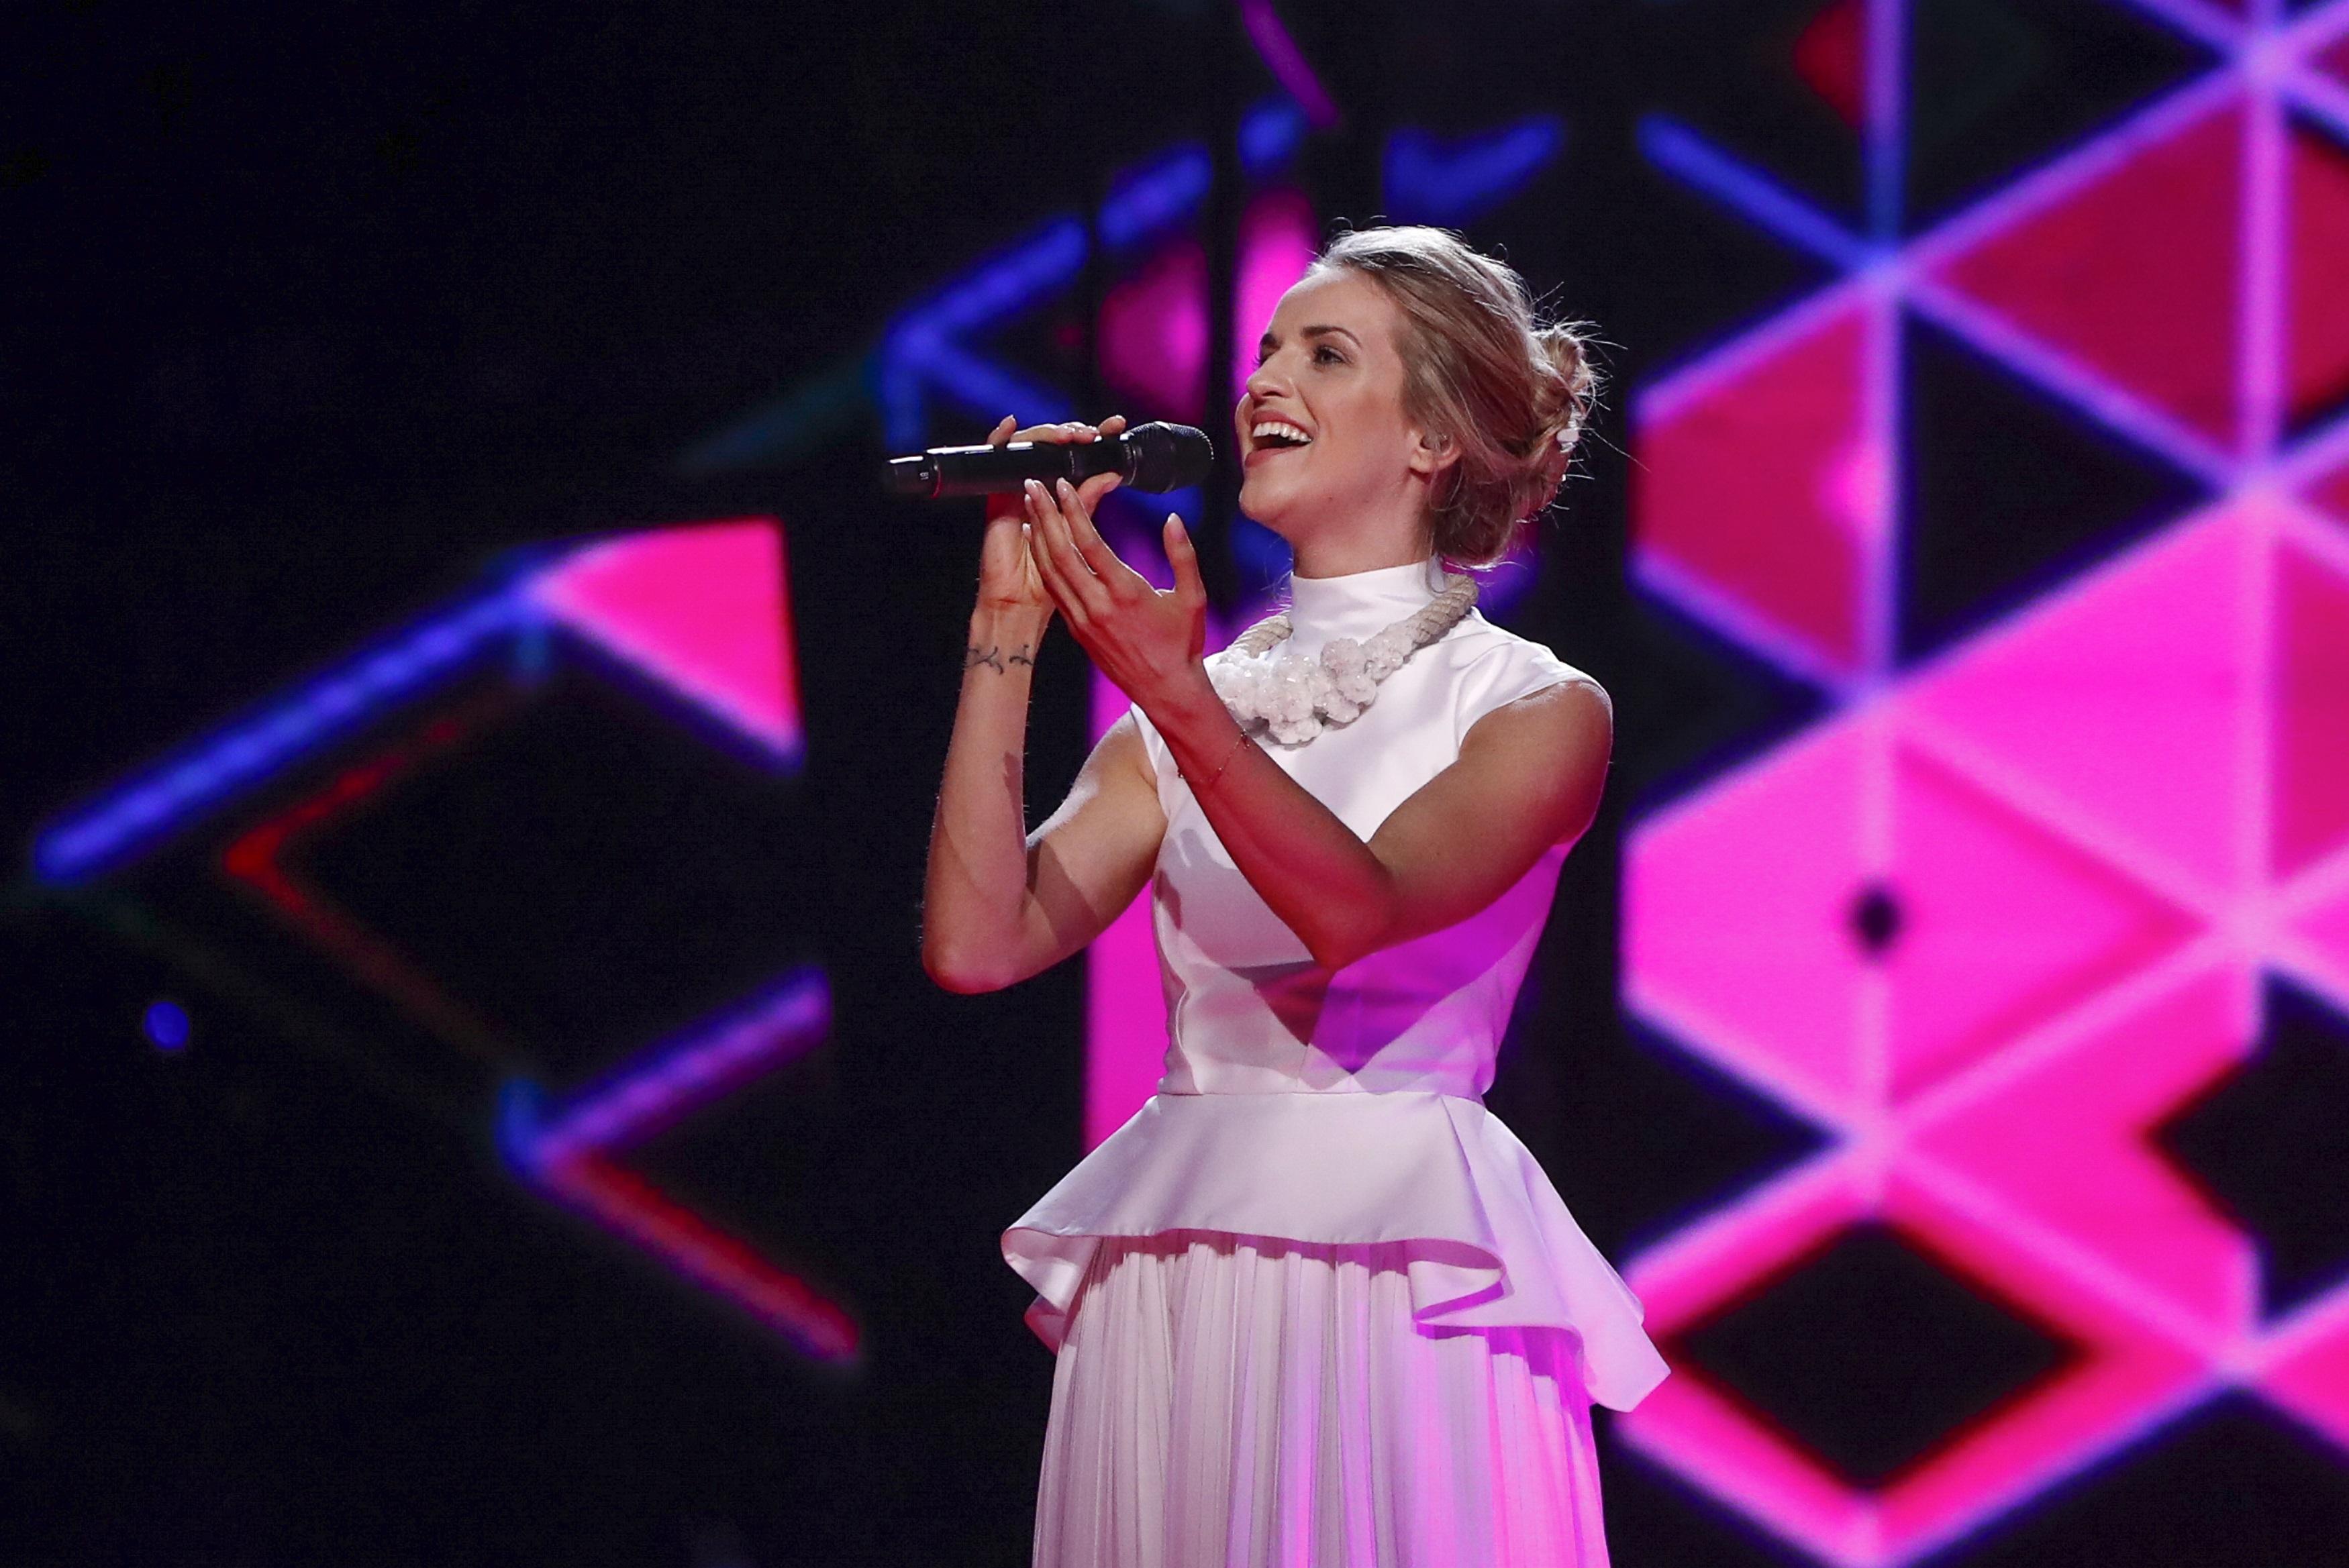 semifinale eurovision